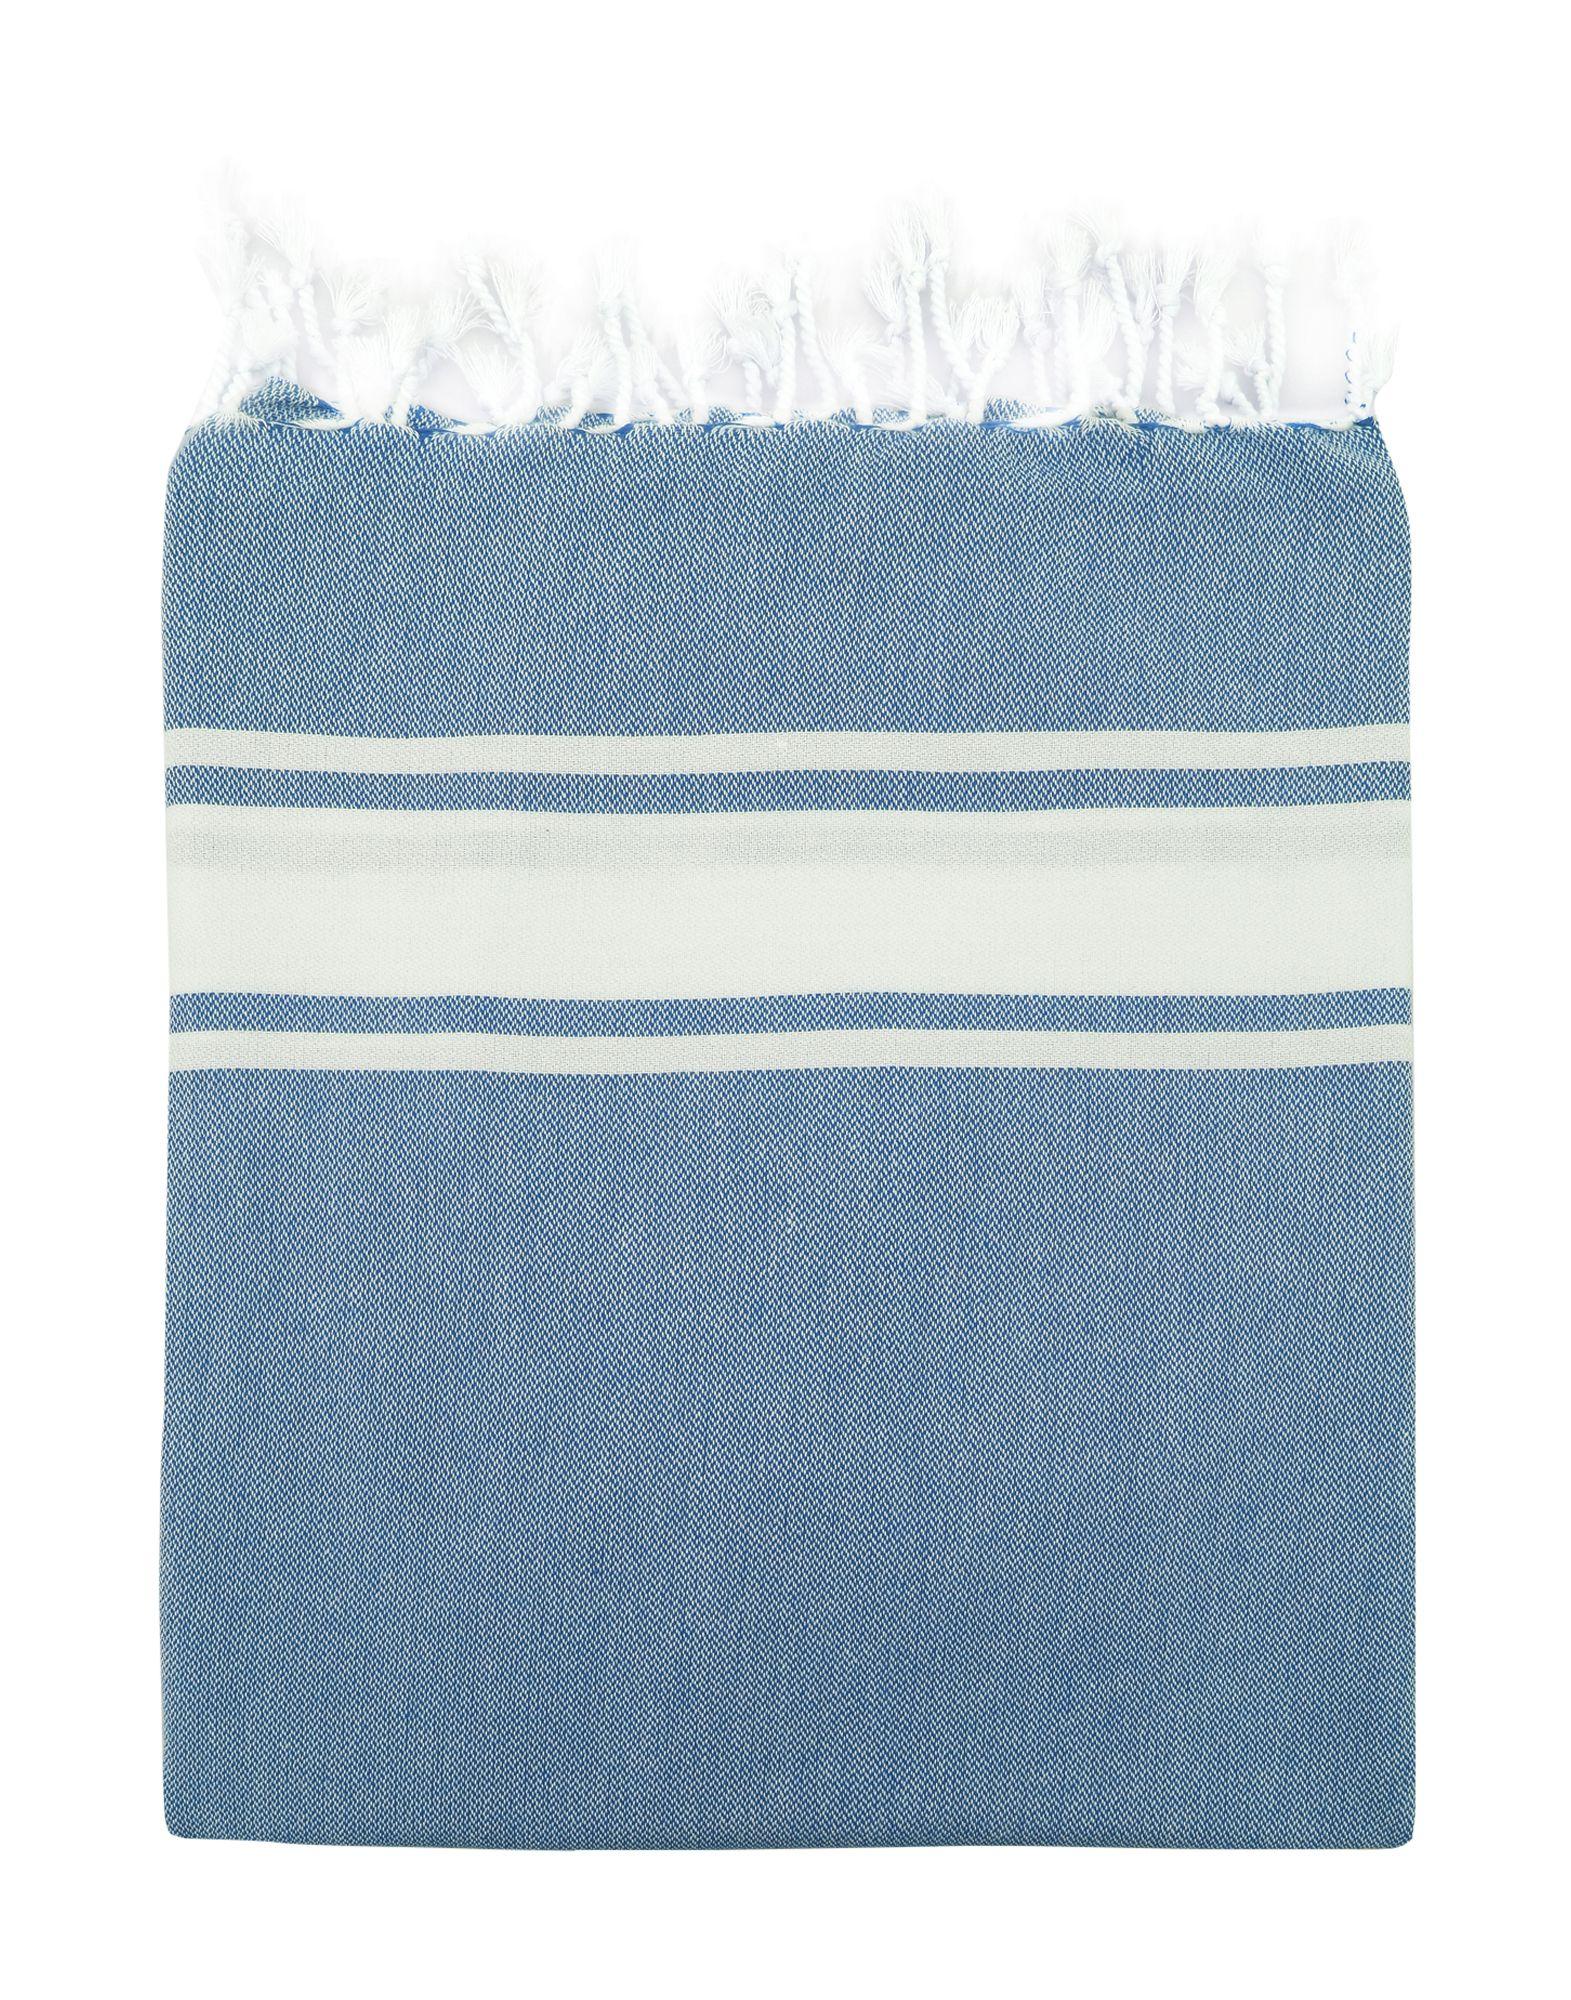 ESPADRIJ Beach towels